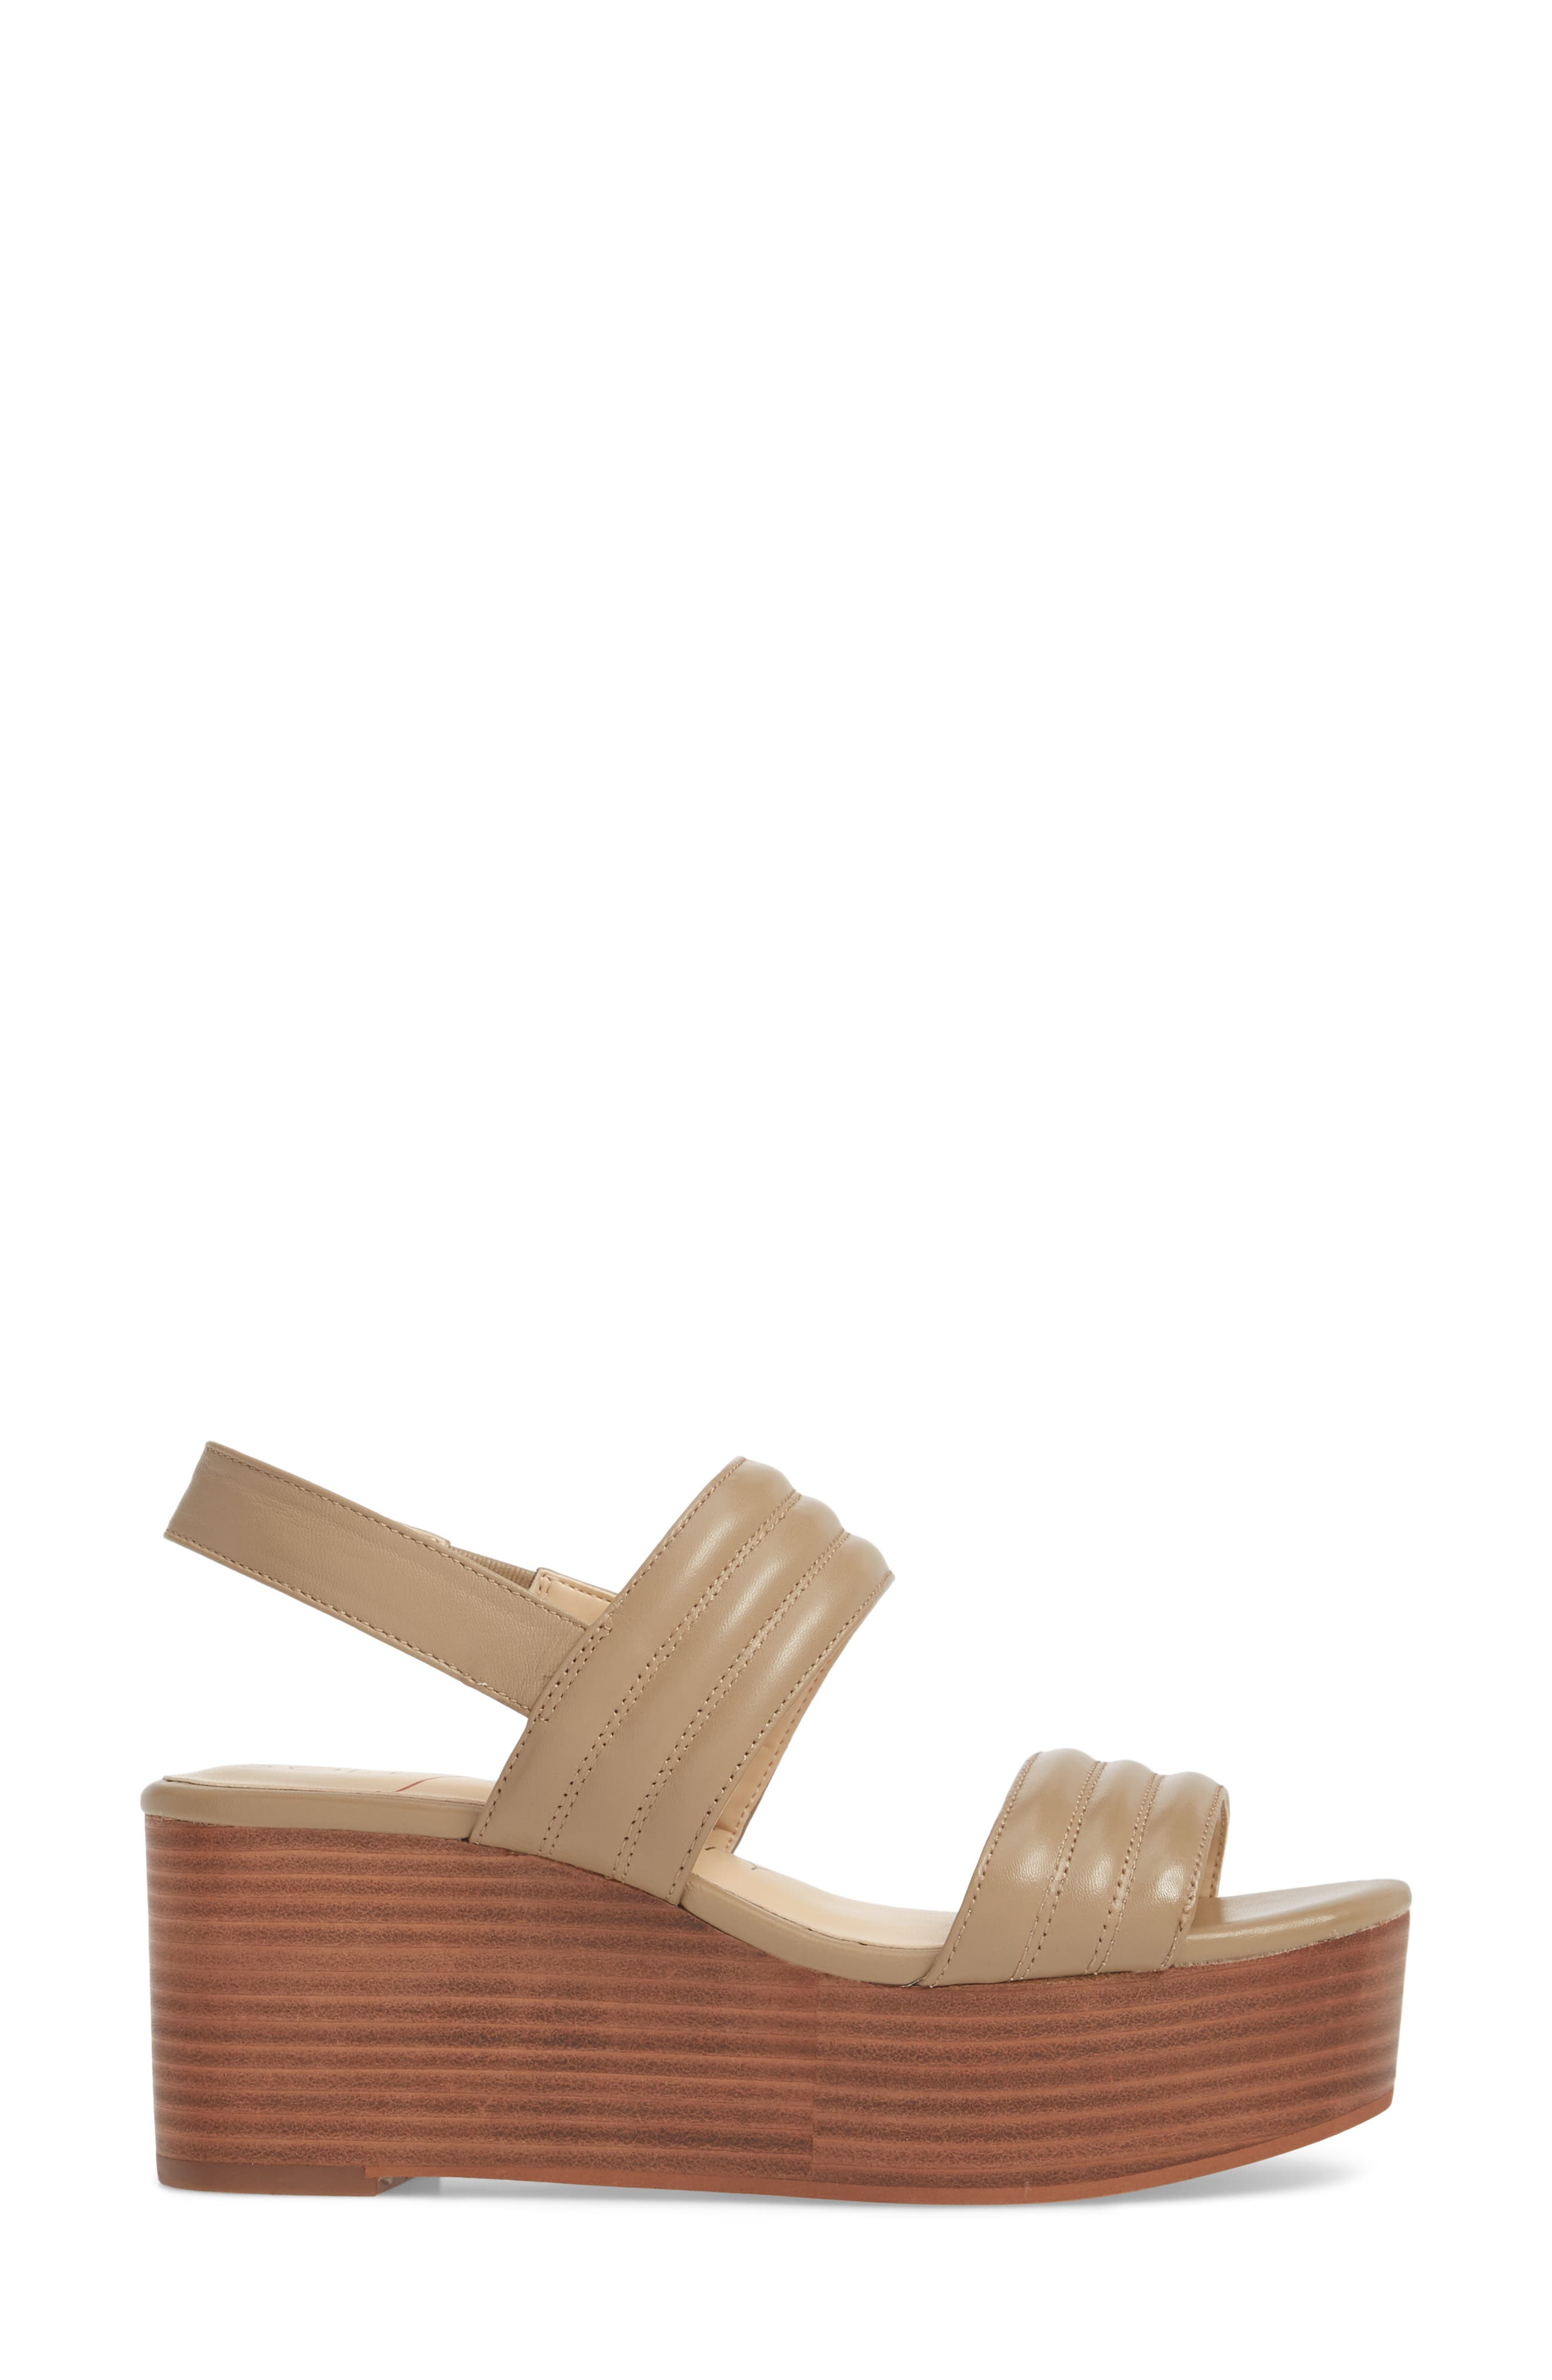 Amberly Platform Sandal,                             Alternate thumbnail 3, color,                             200